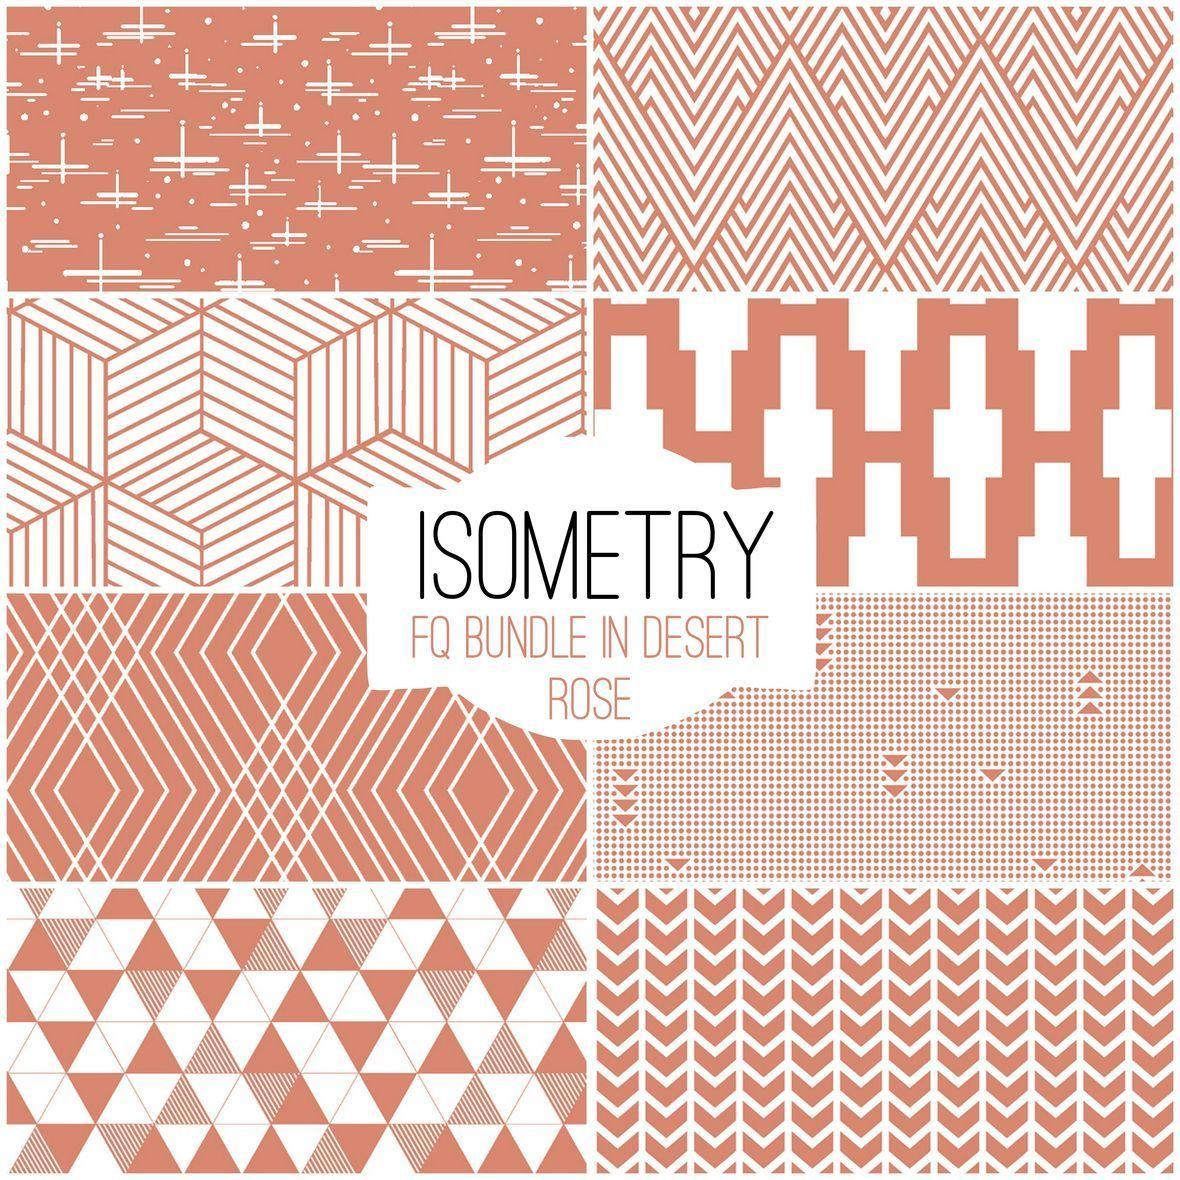 Isometry iin Desert Rose